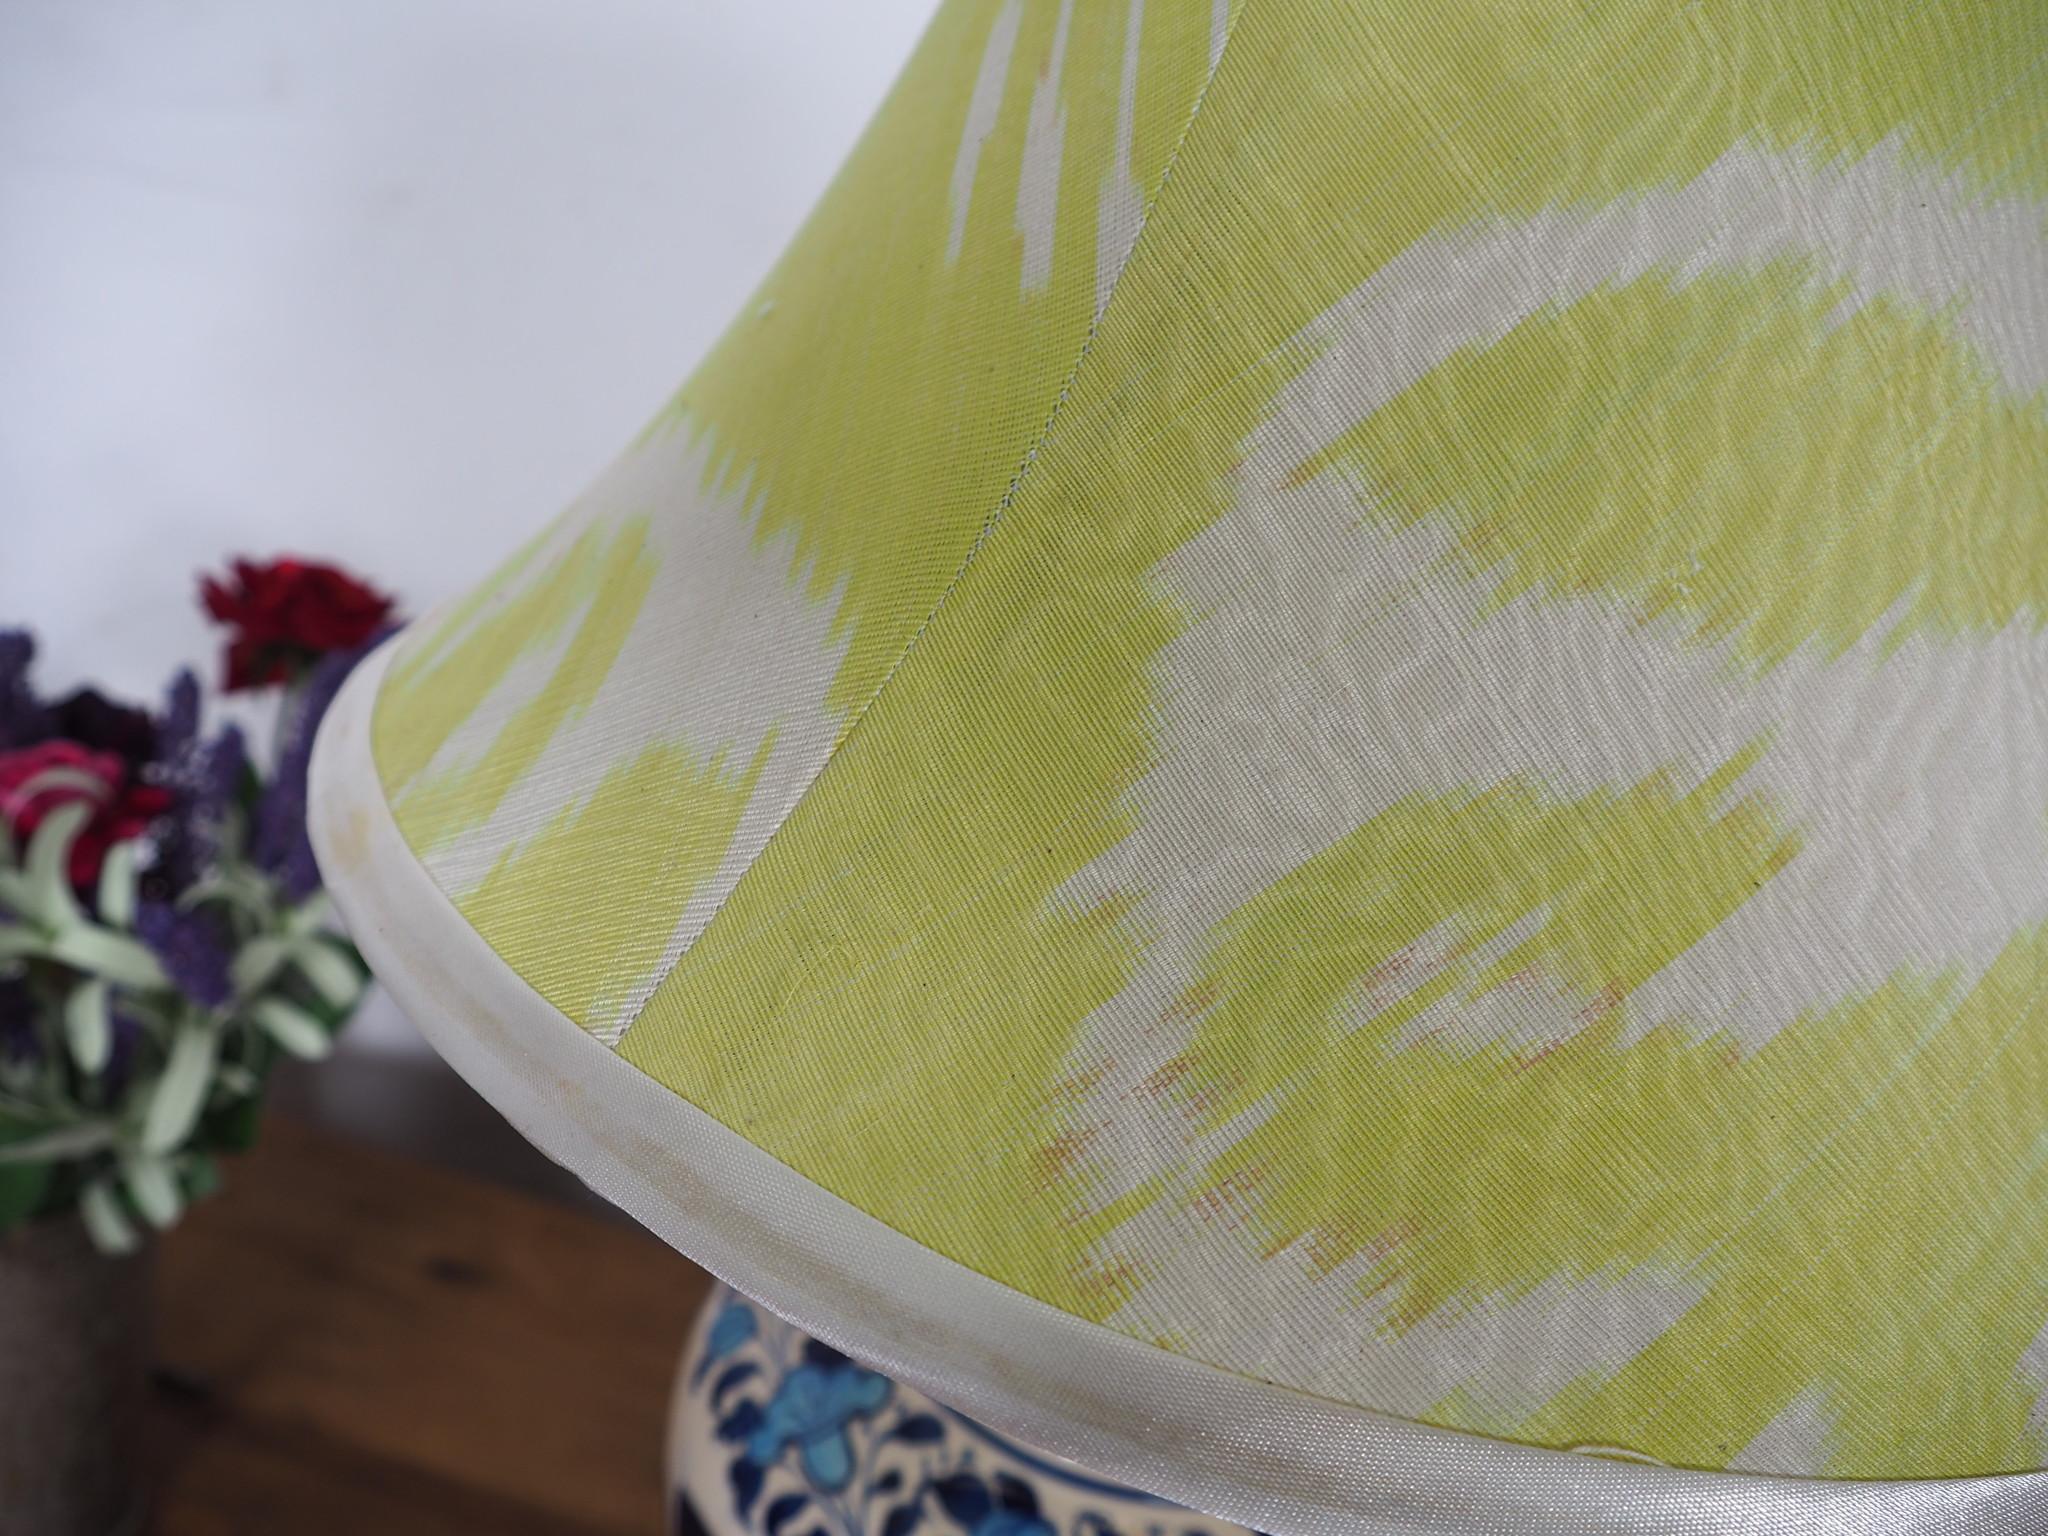 extravagant orient Uzbek Ikat stoff Schirm Lampenschirm Leuchtenschirm lampshade Nr:C